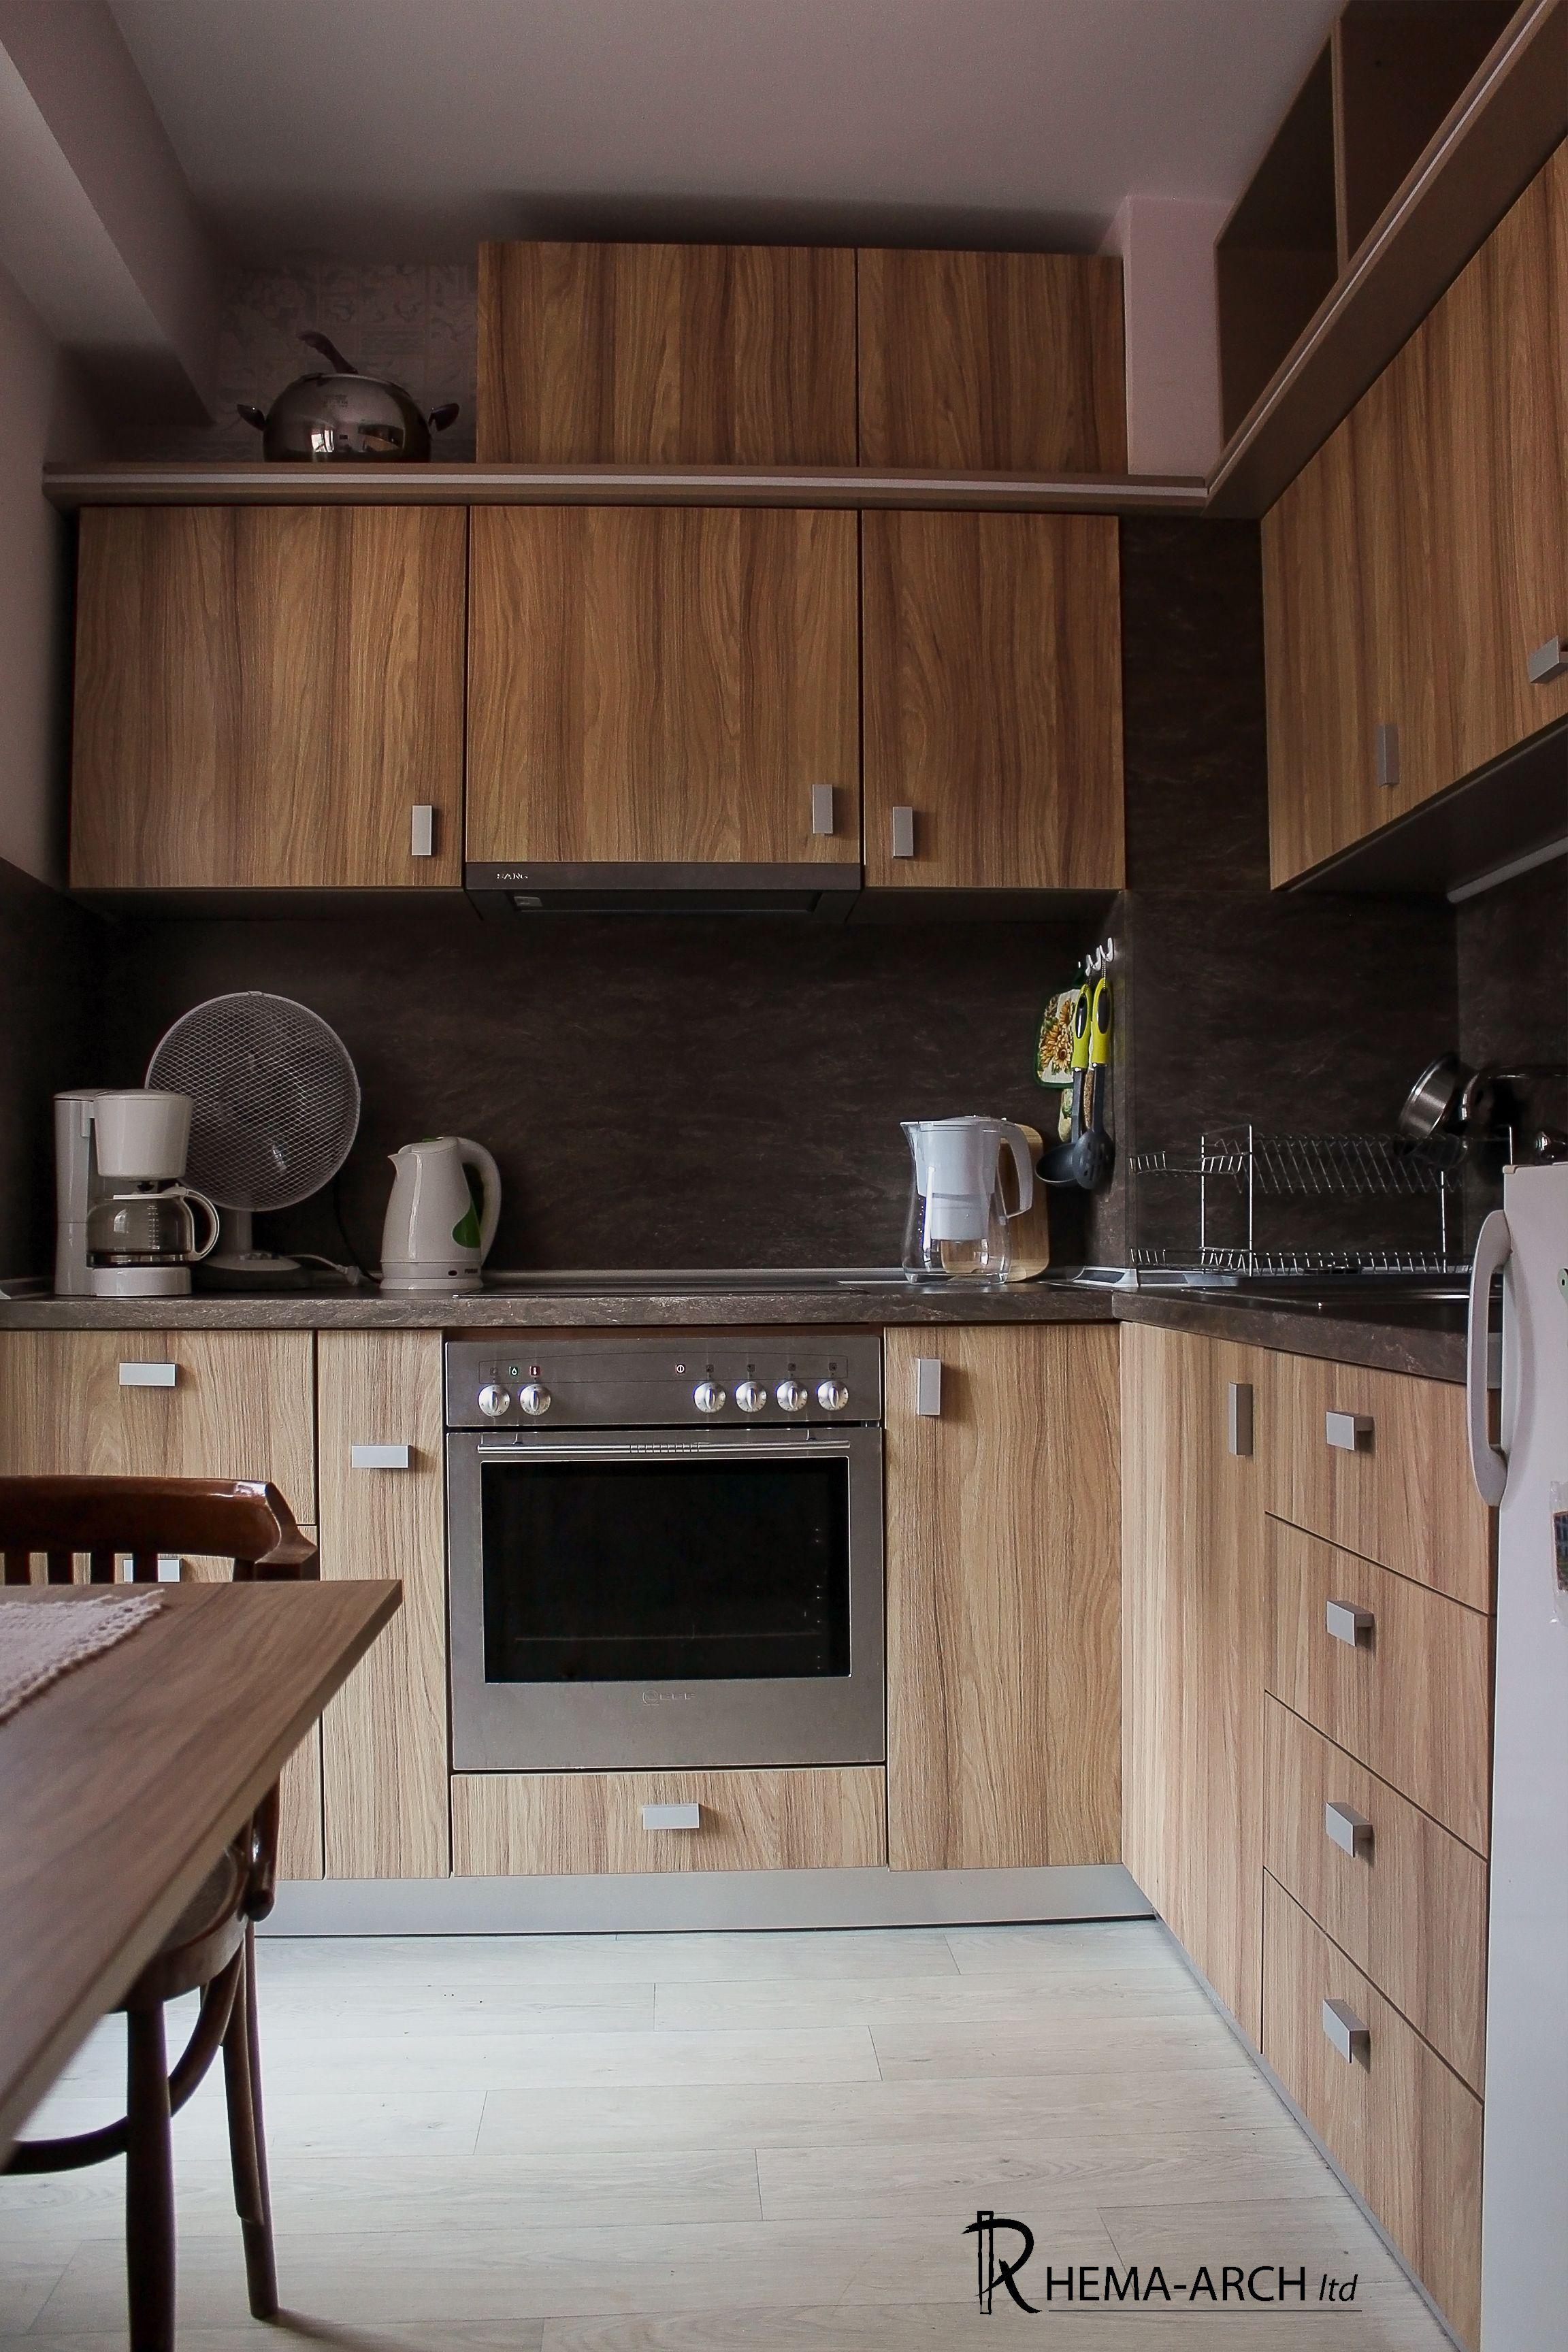 Design and creation of kitchen on a budget bu Rhema-arch ...